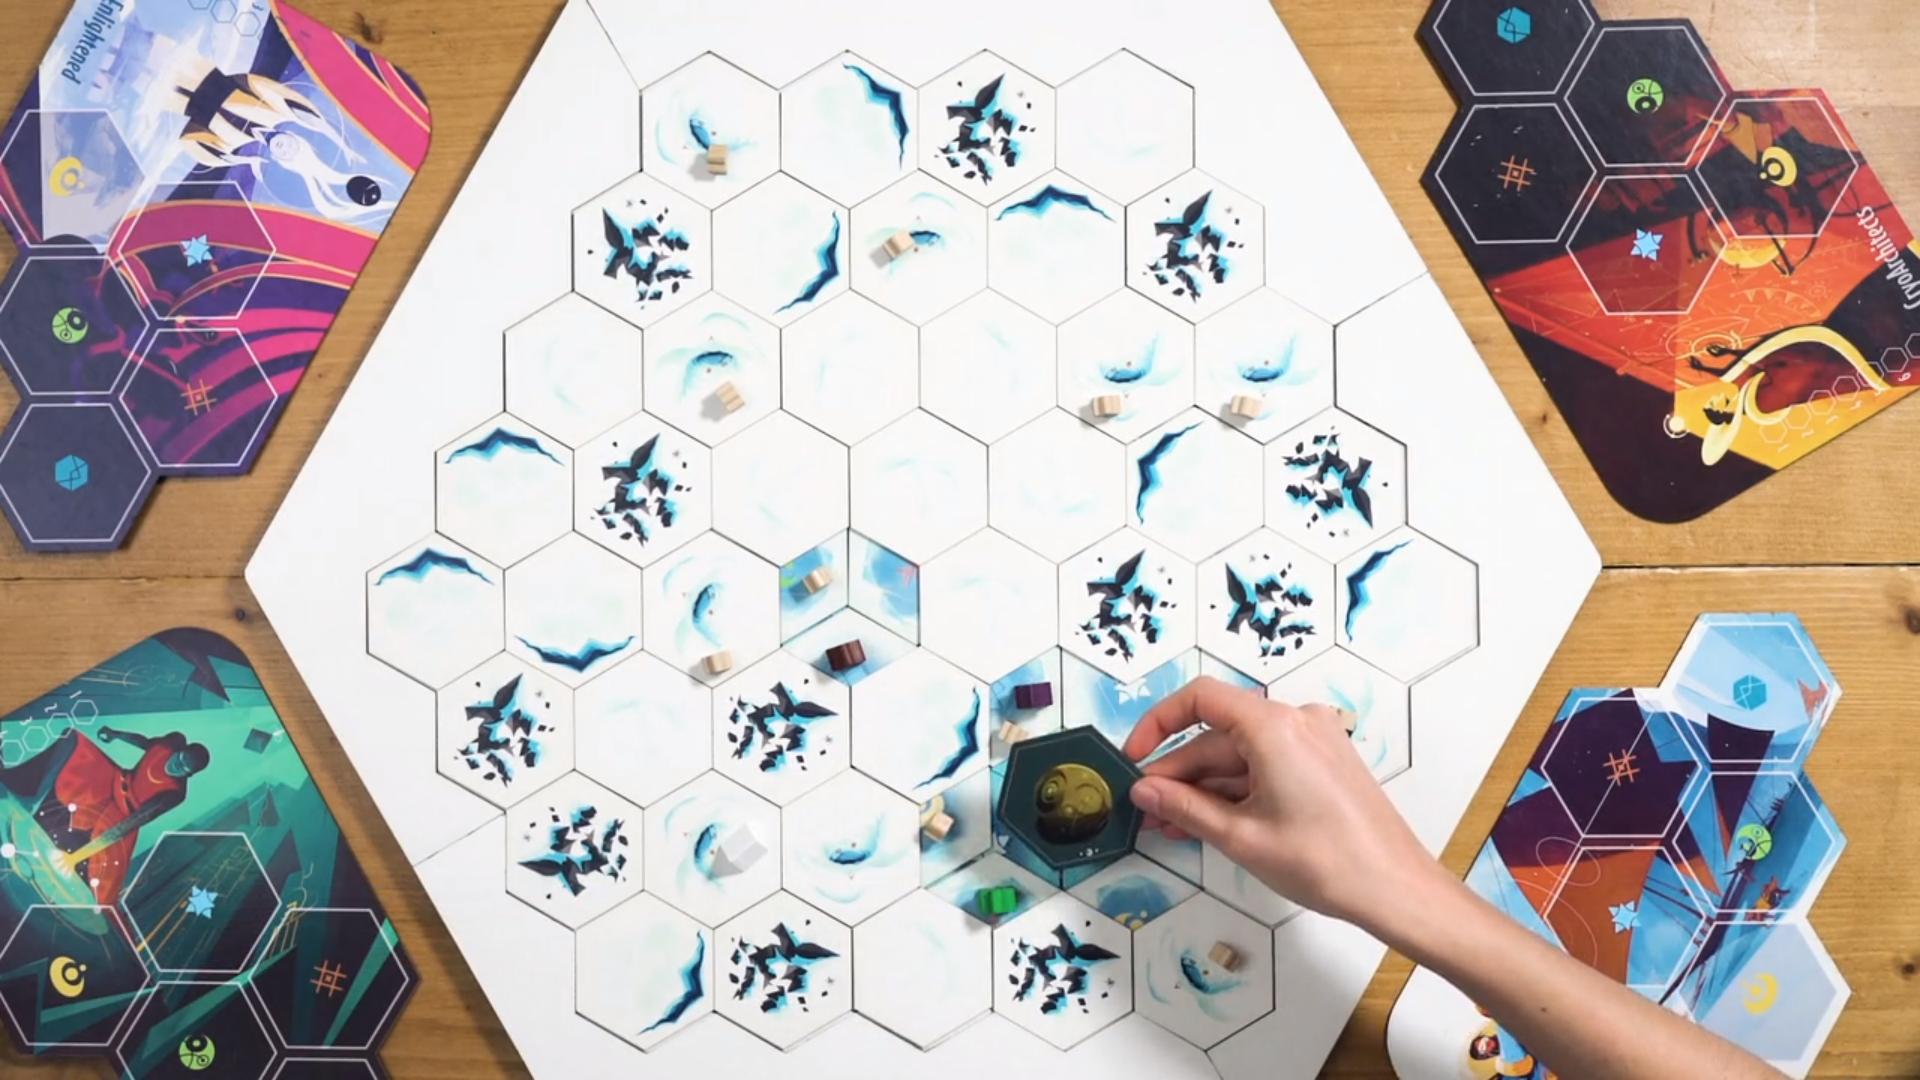 ice-board-game-board-setup.png